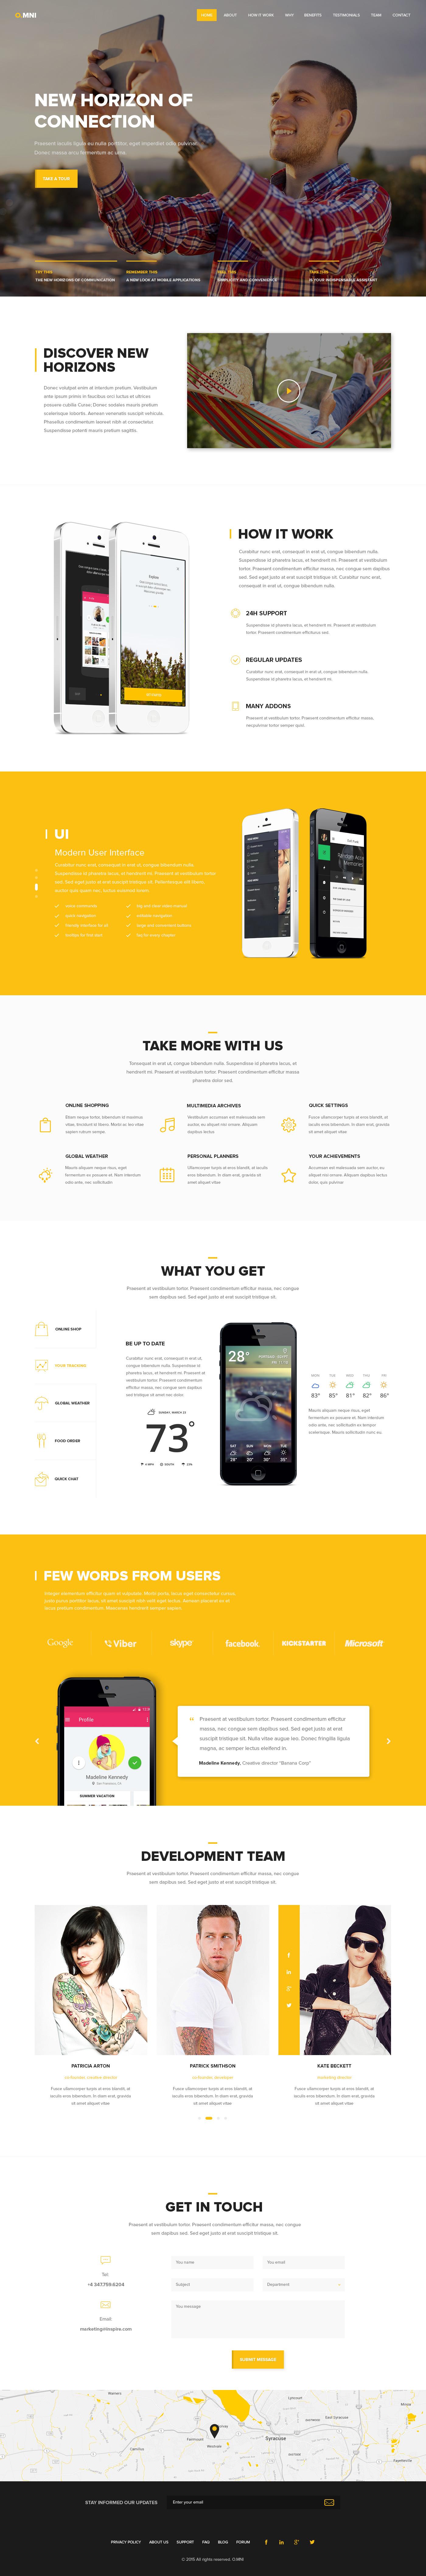 Omni - Modern HTML App Template by UnionAgency   ThemeForest